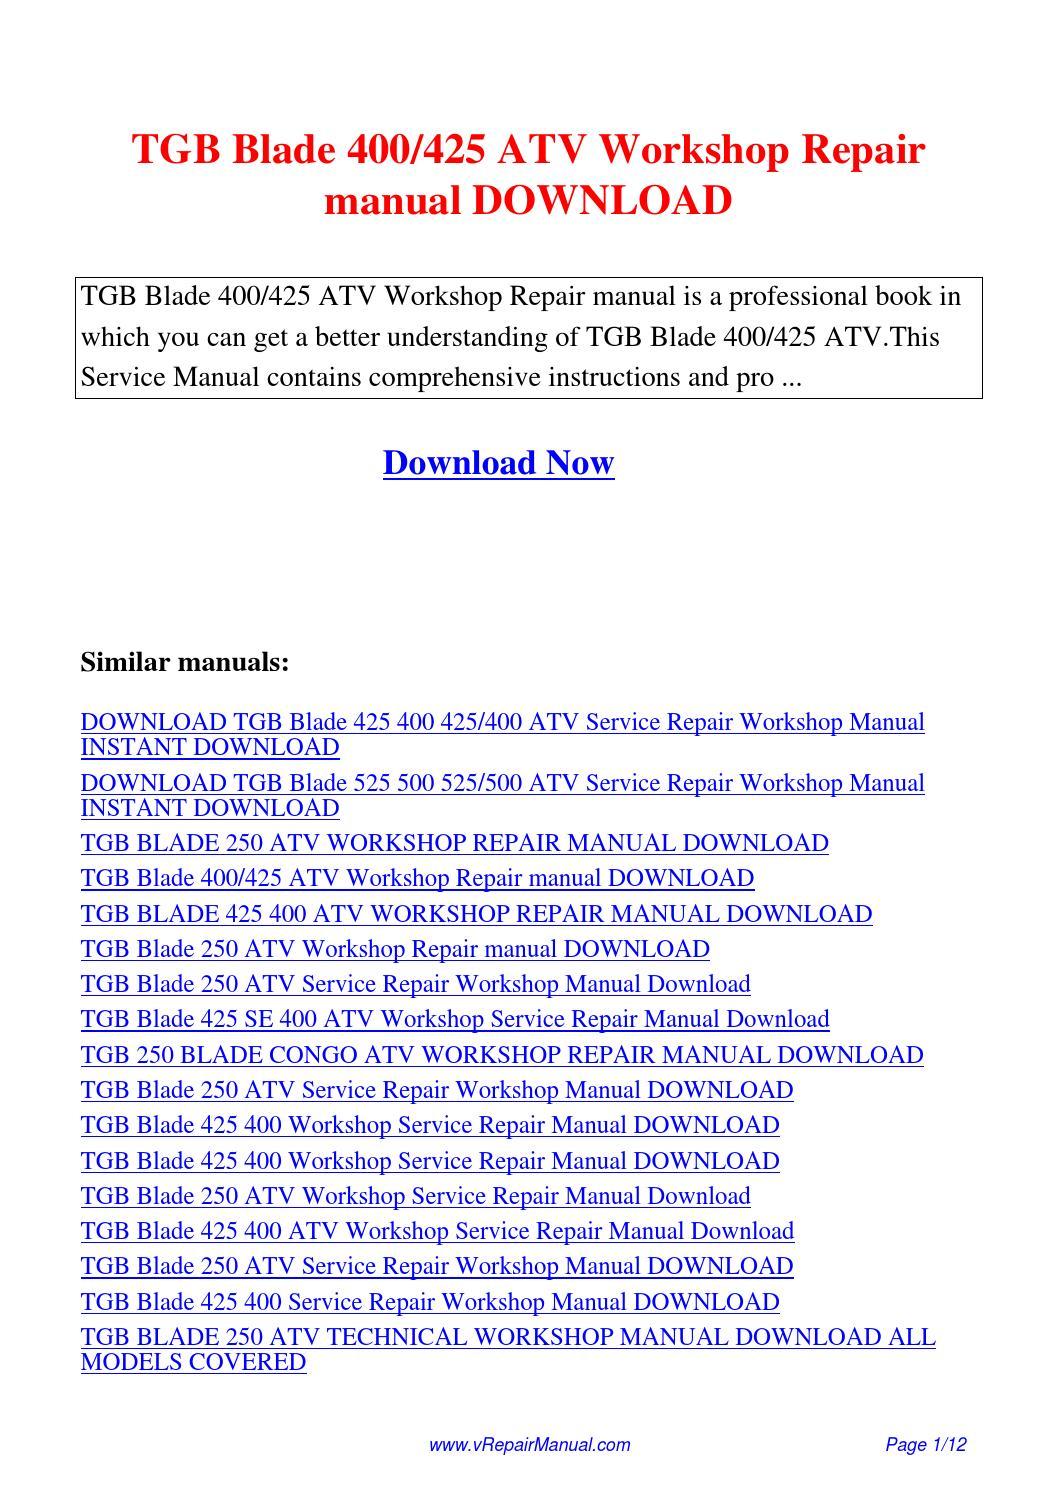 TGB Blade 400 425 ATV Workshop Repair manual.pdf by David Zhang - issuu